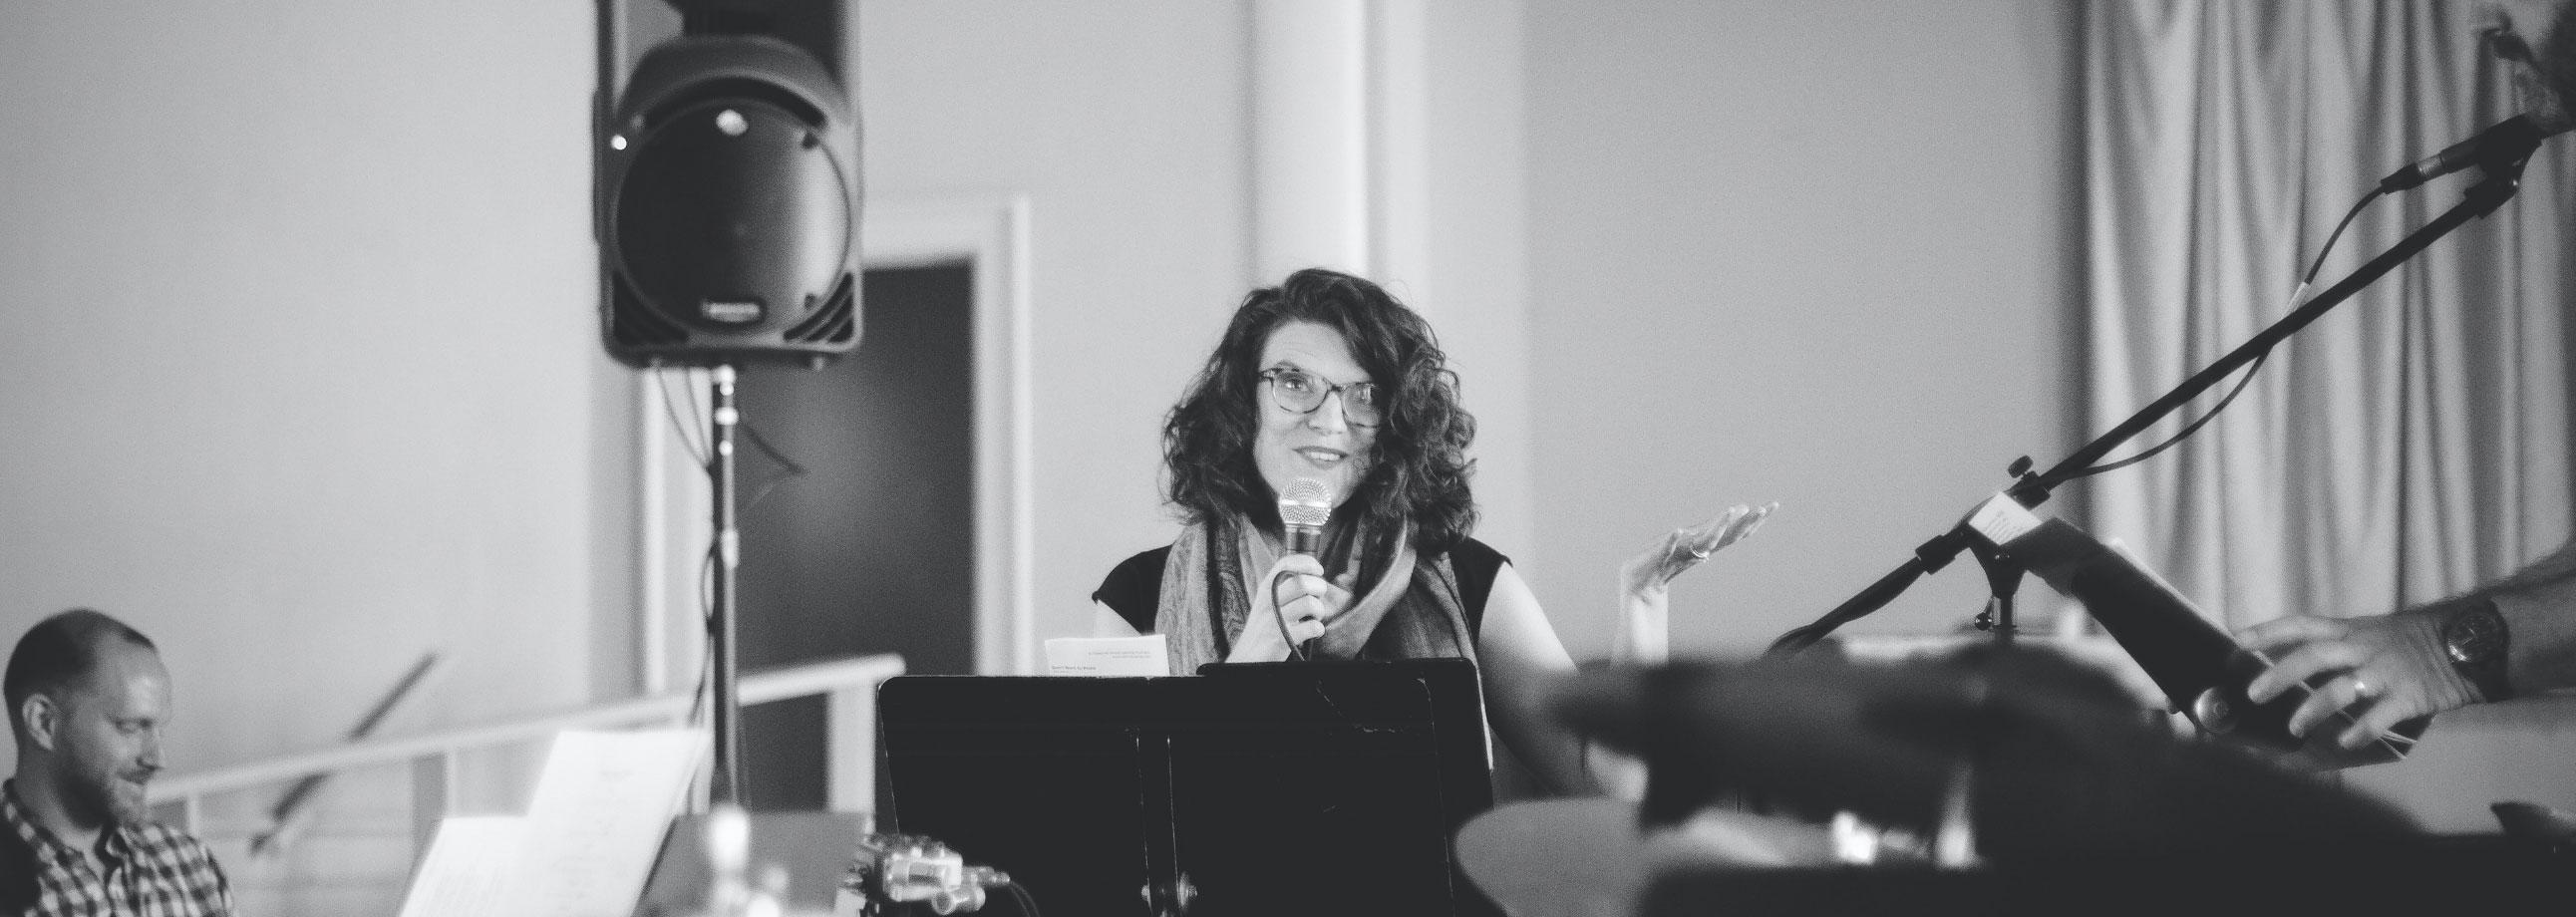 Early Career Pastors as Generative Community Leaders